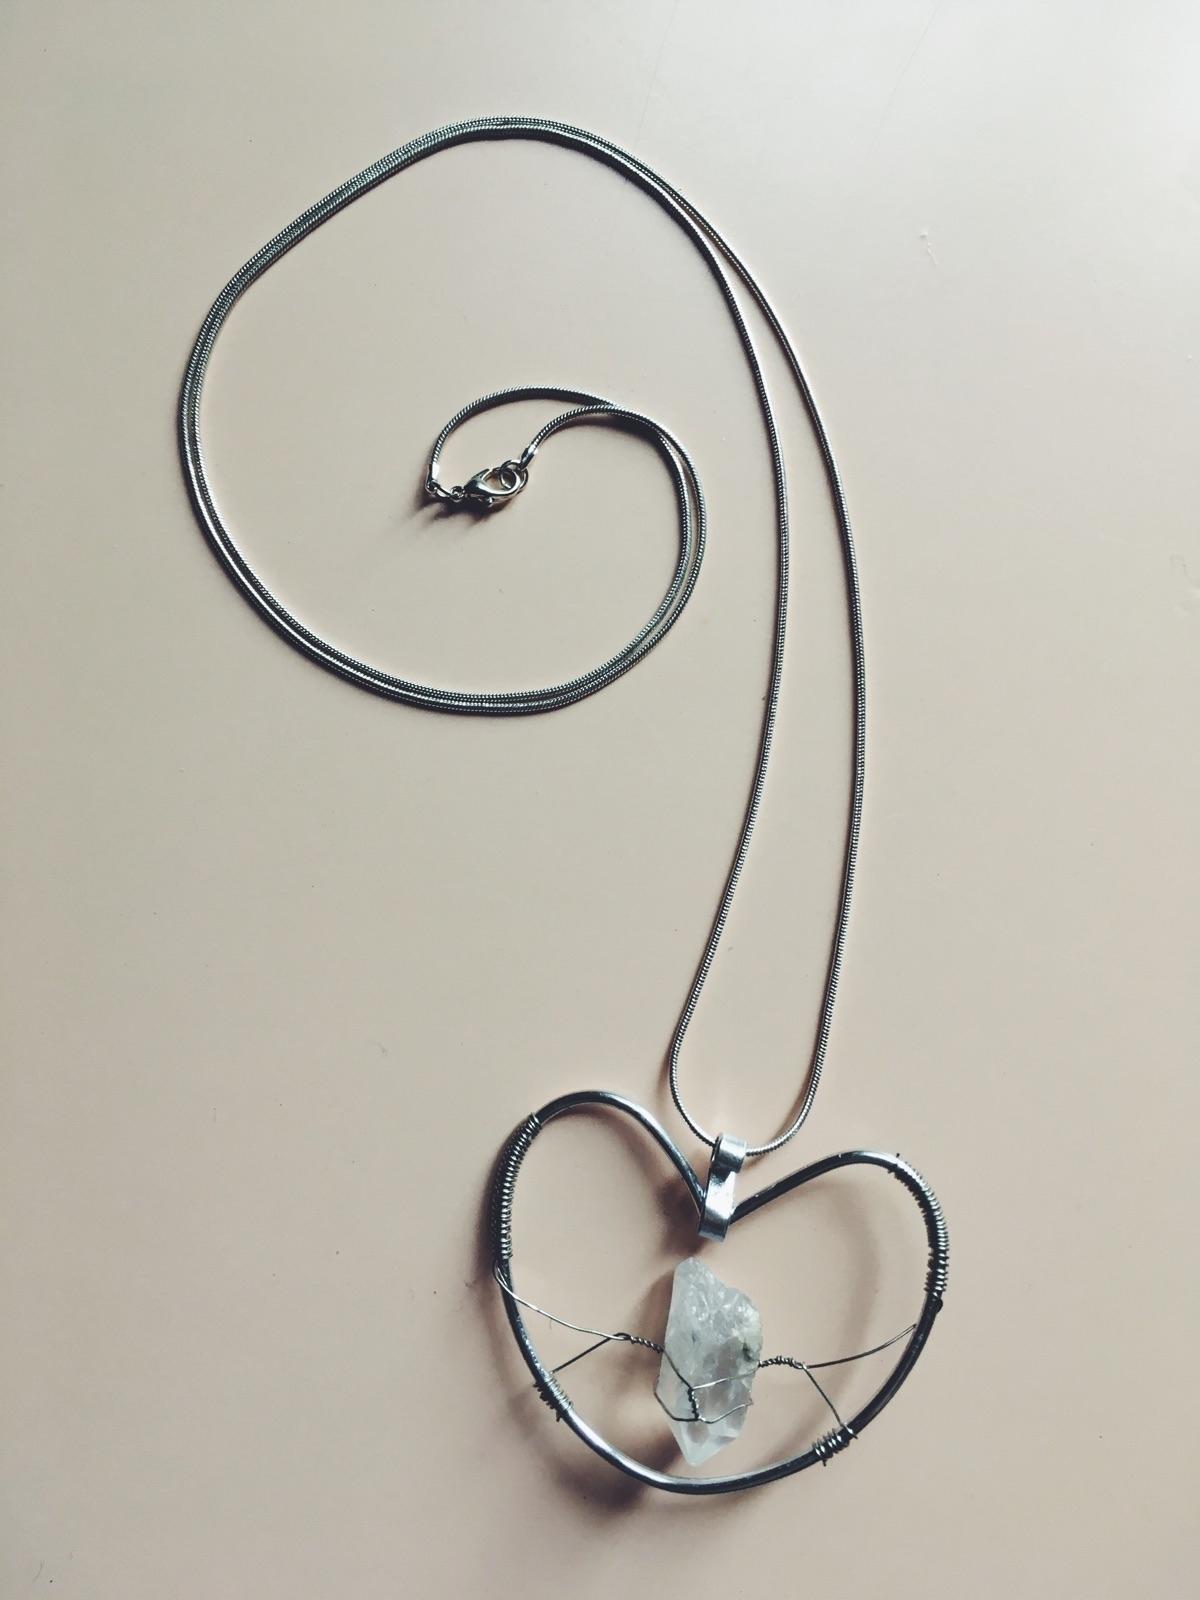 Love Dreamcatcher Necklace / $2 - iiindigoaura | ello